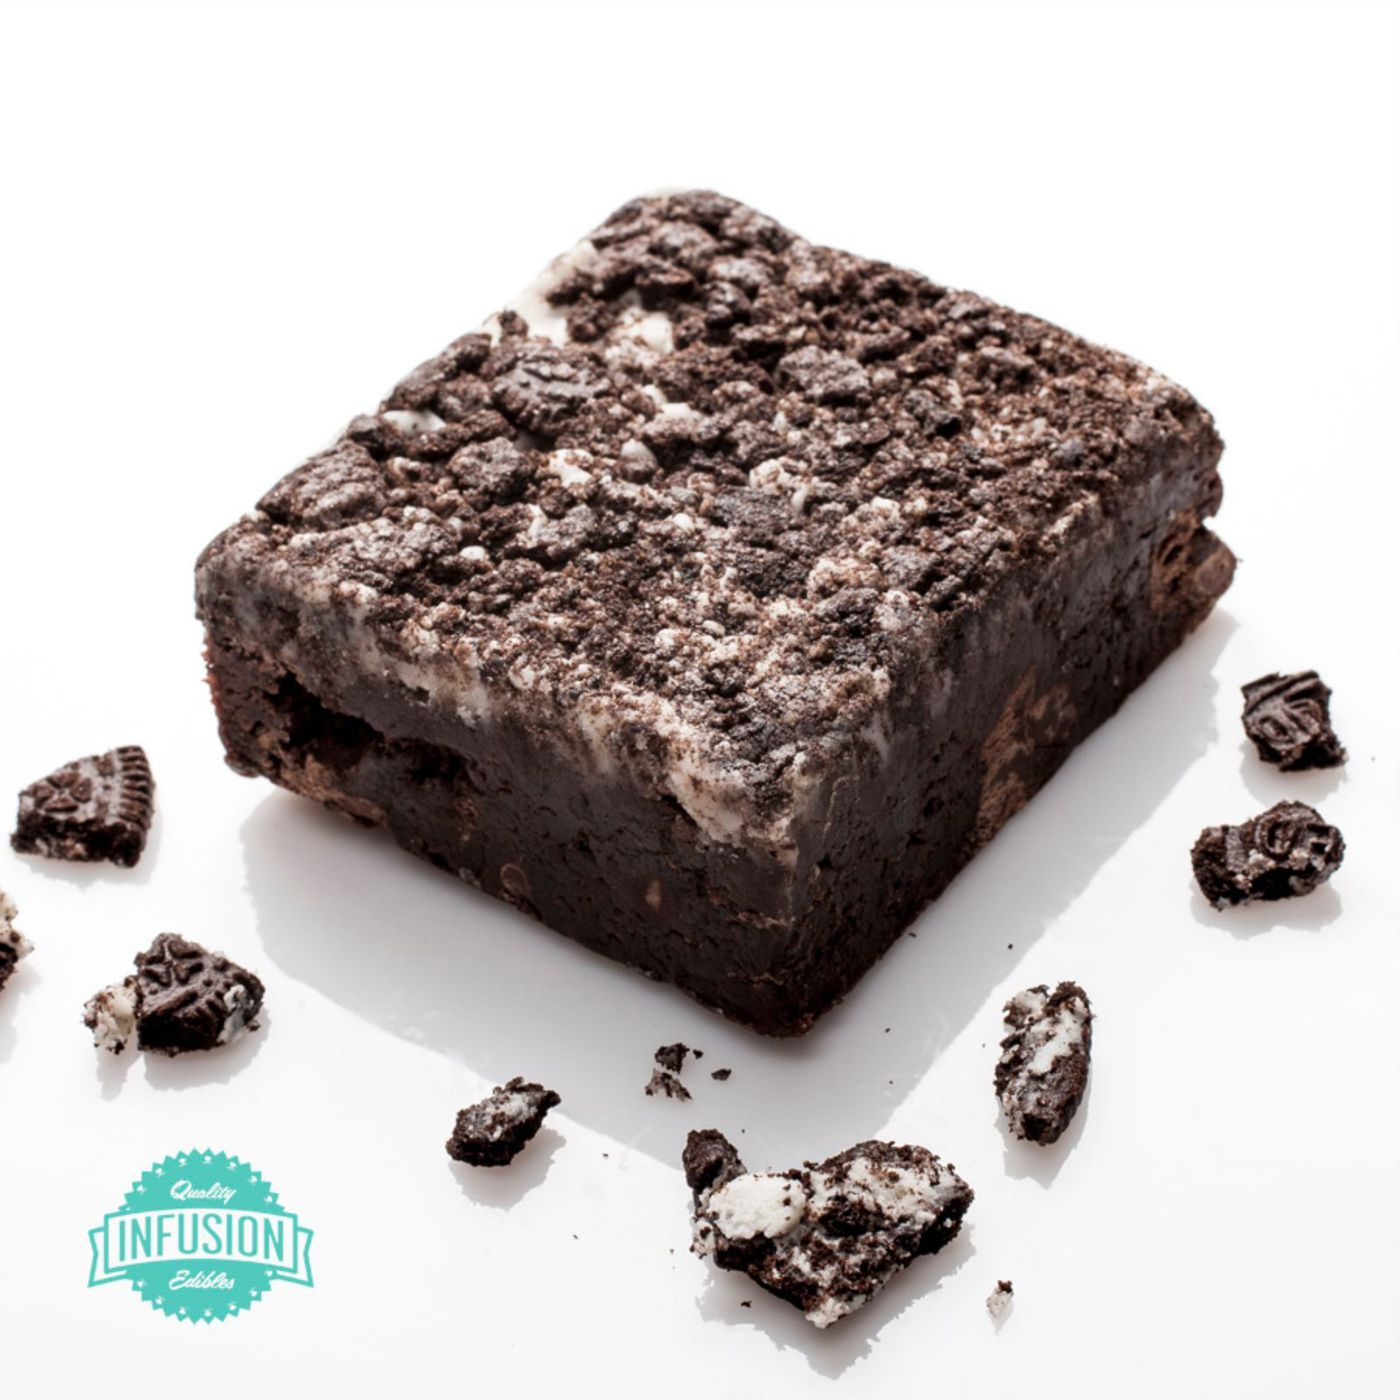 brownies with marijuana | 420 edibles recipes| buy 420 edibles